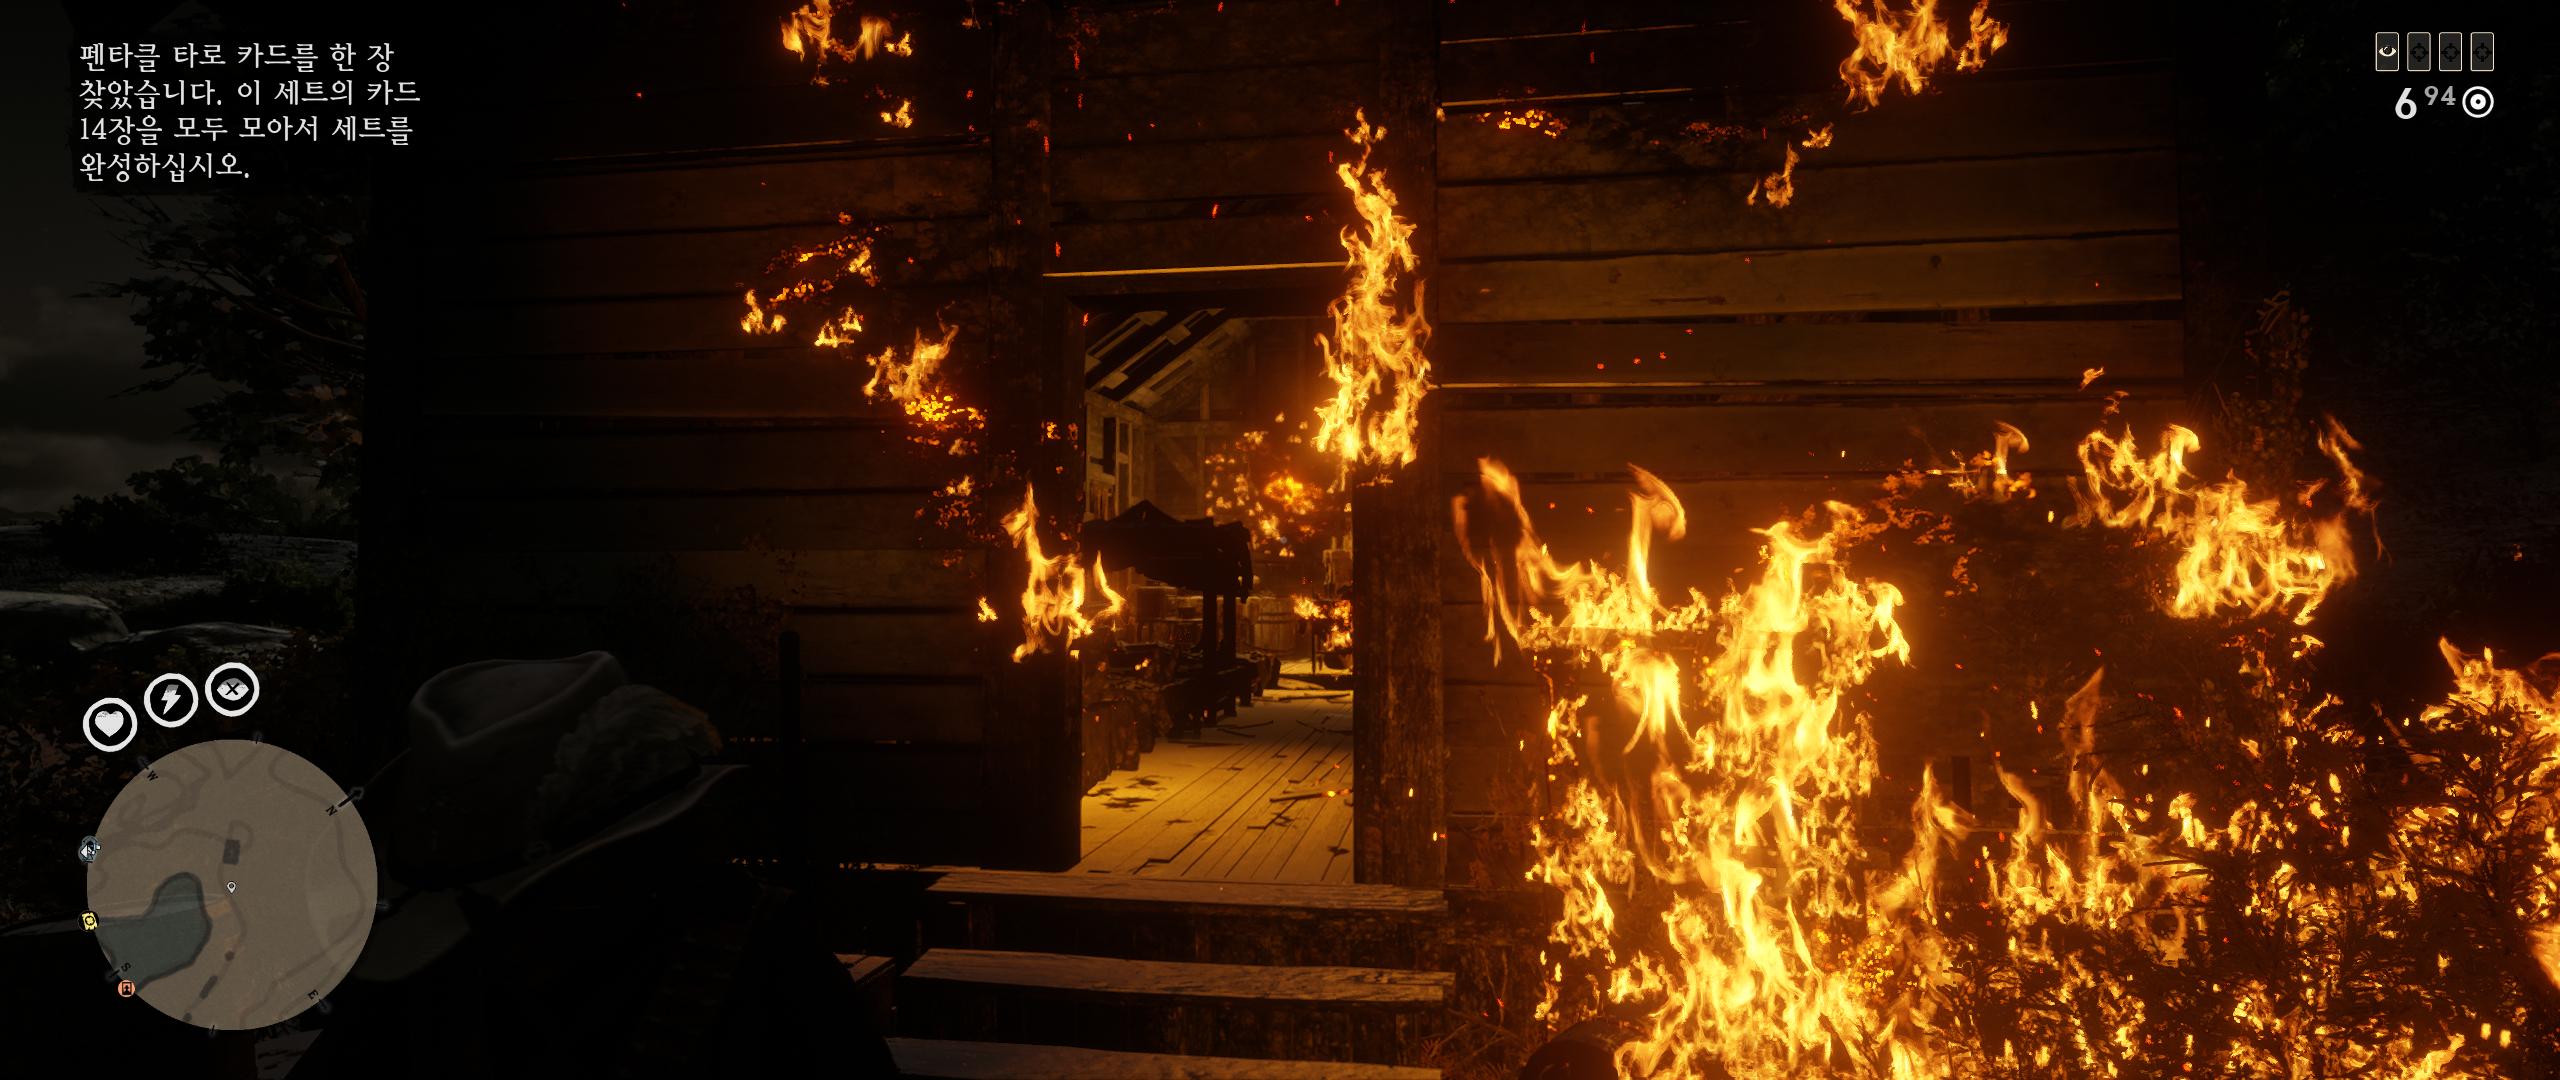 Red Dead Redemption 2 Screenshot 2019.12.22 - 15.29.00.75